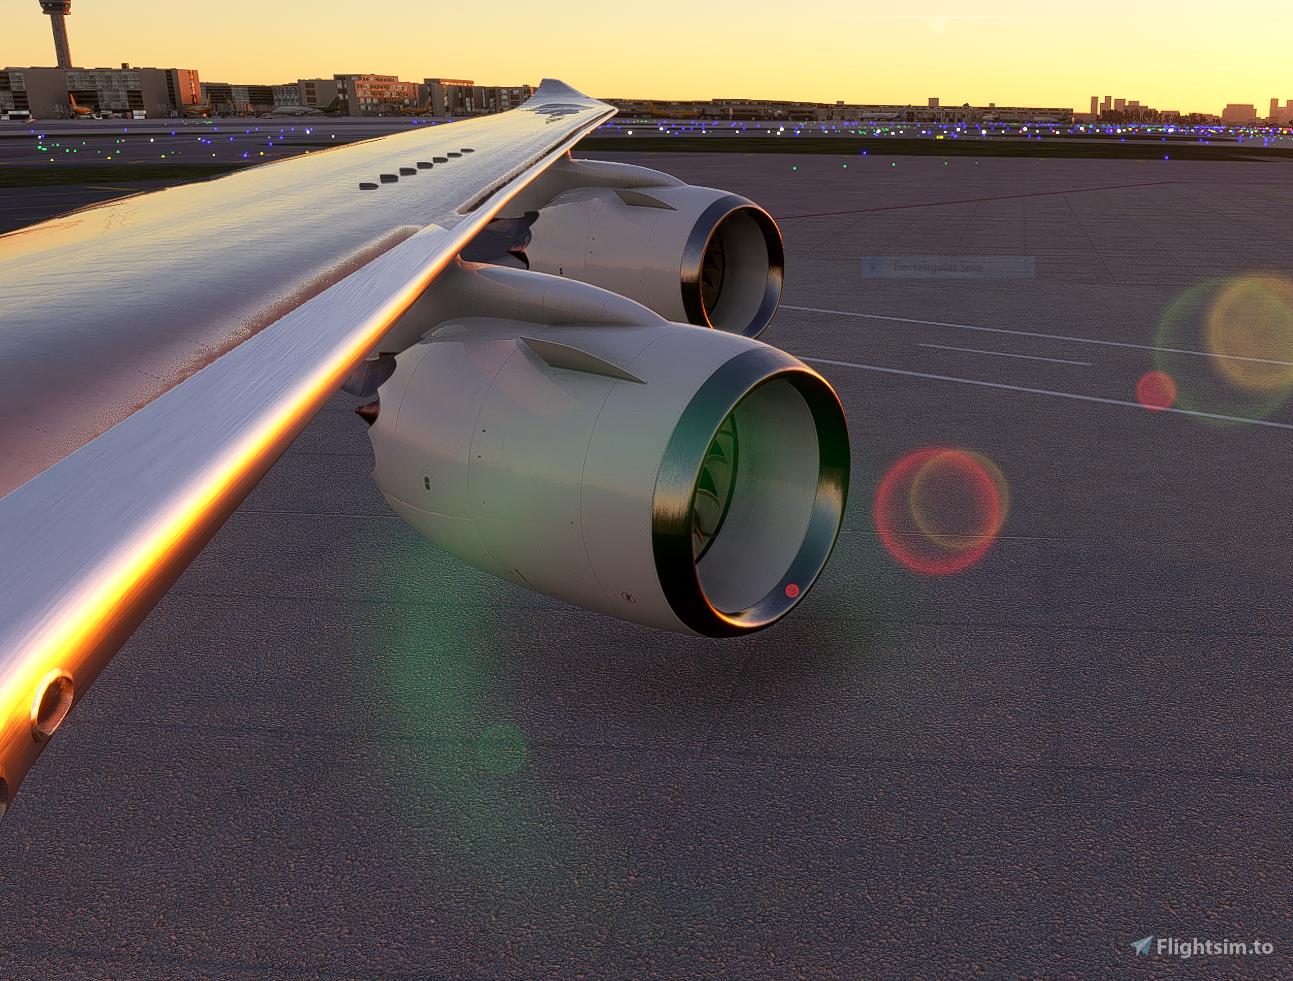 B747 NEW VIEW 2020 Flight Simulator 2020